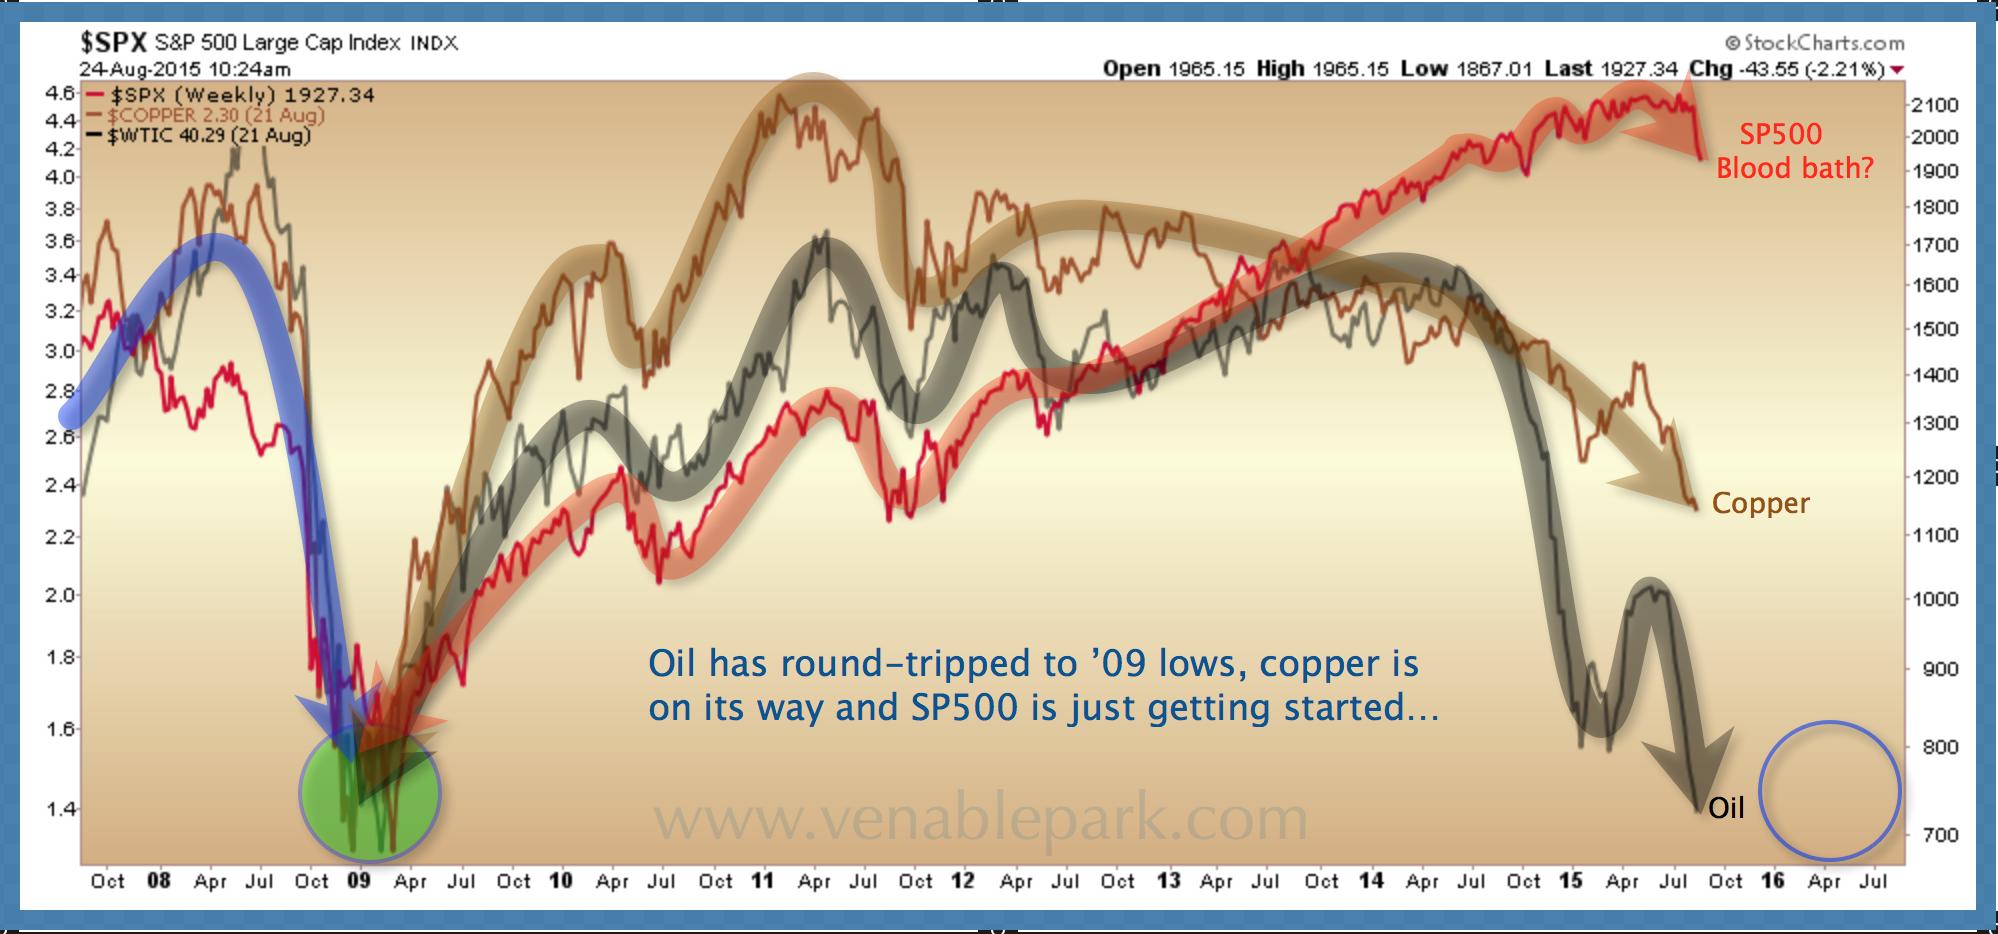 S&P bloodbath?